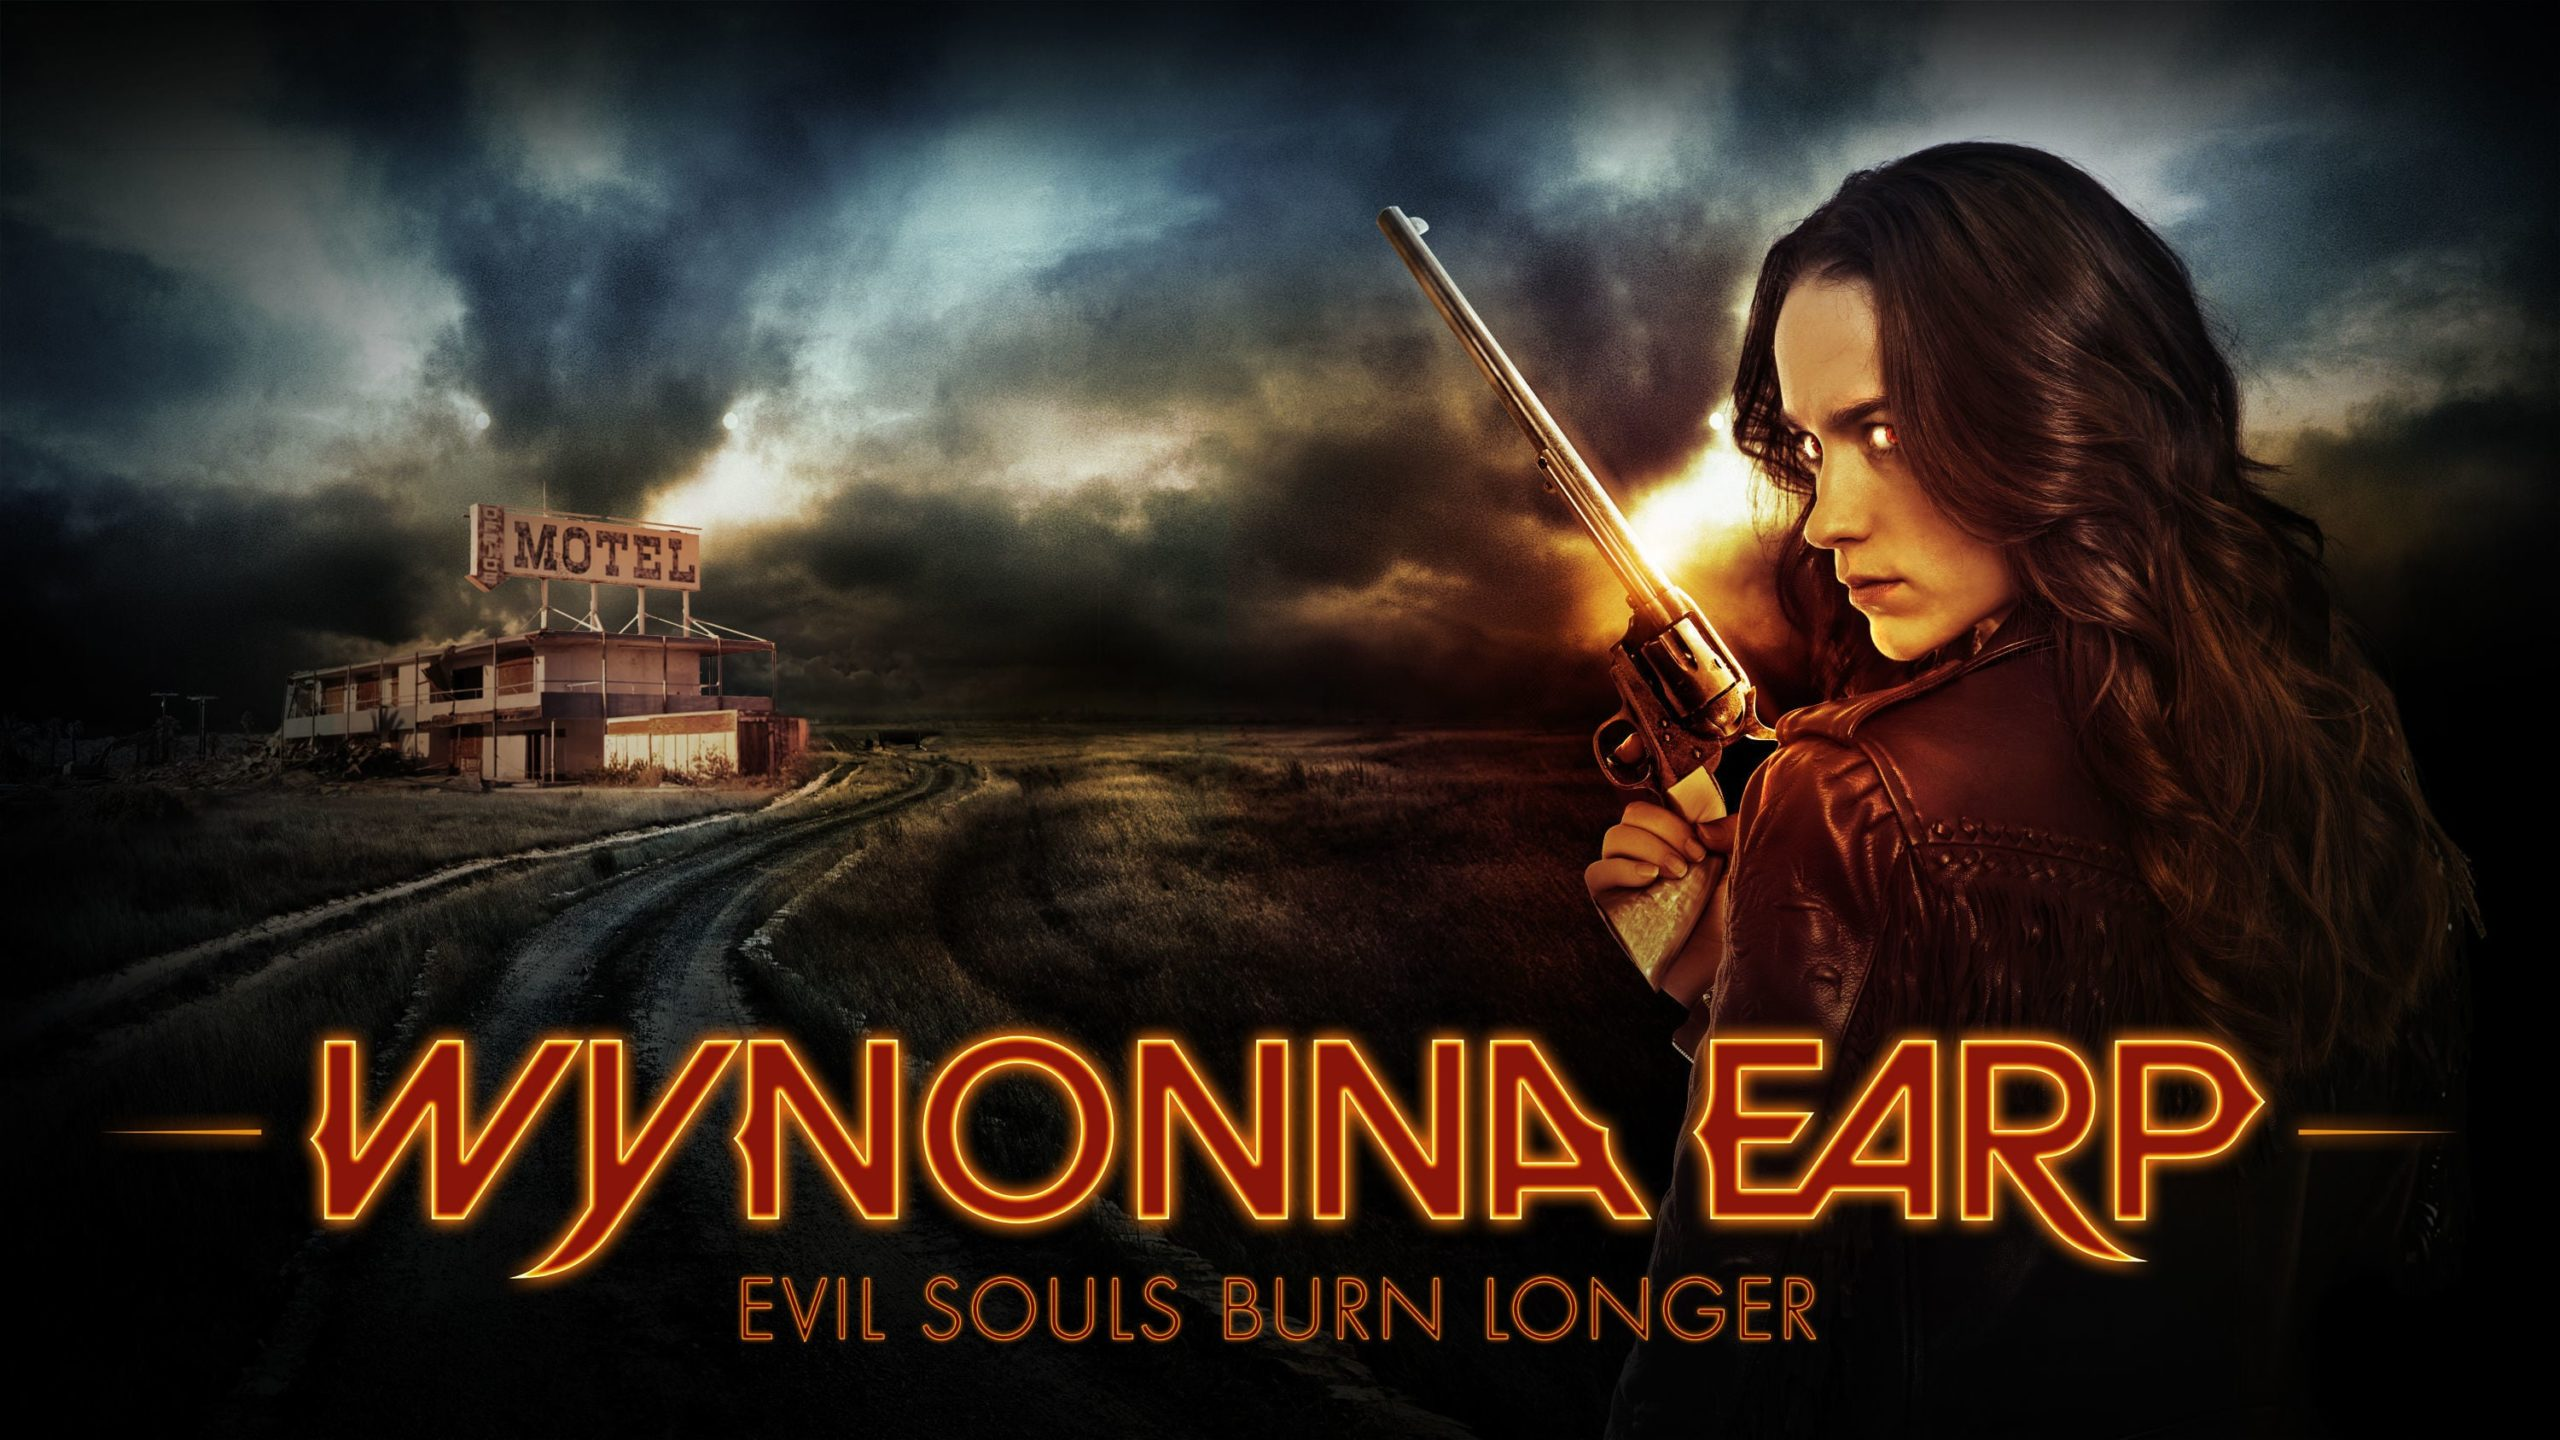 Wynonna Earp Season 4 Episode 4